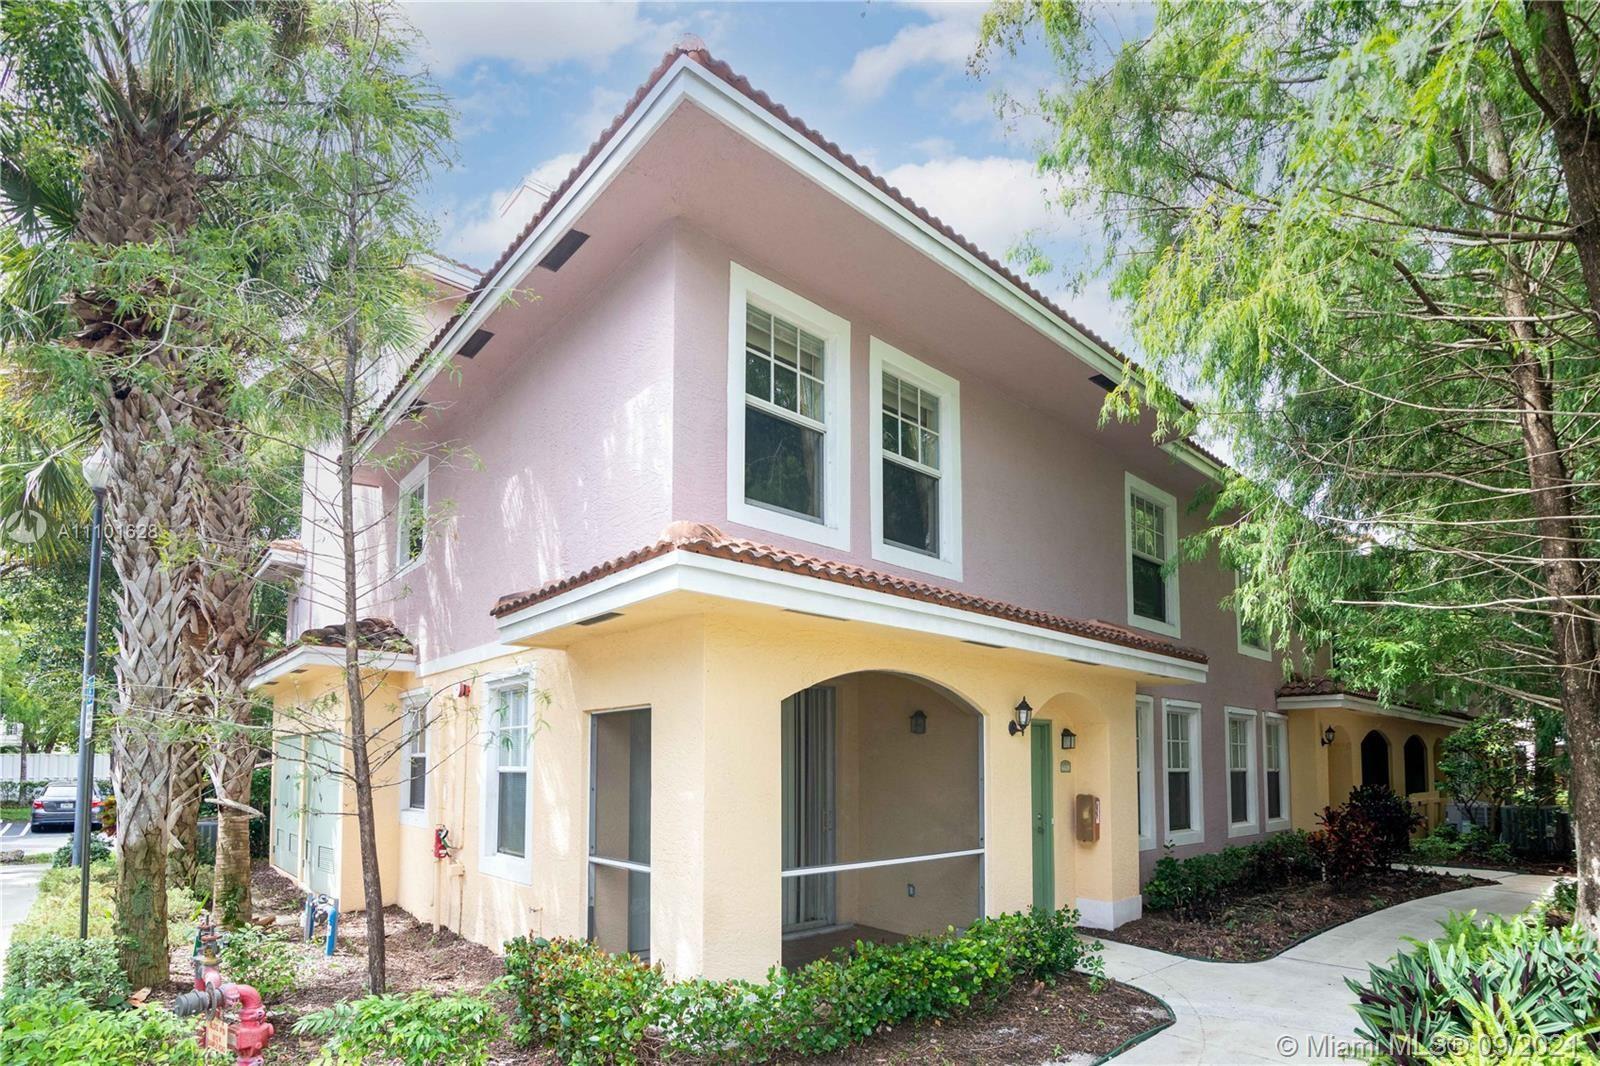 6620 W Sample Rd #6620, Coral Springs, FL 33067 - #: A11101628